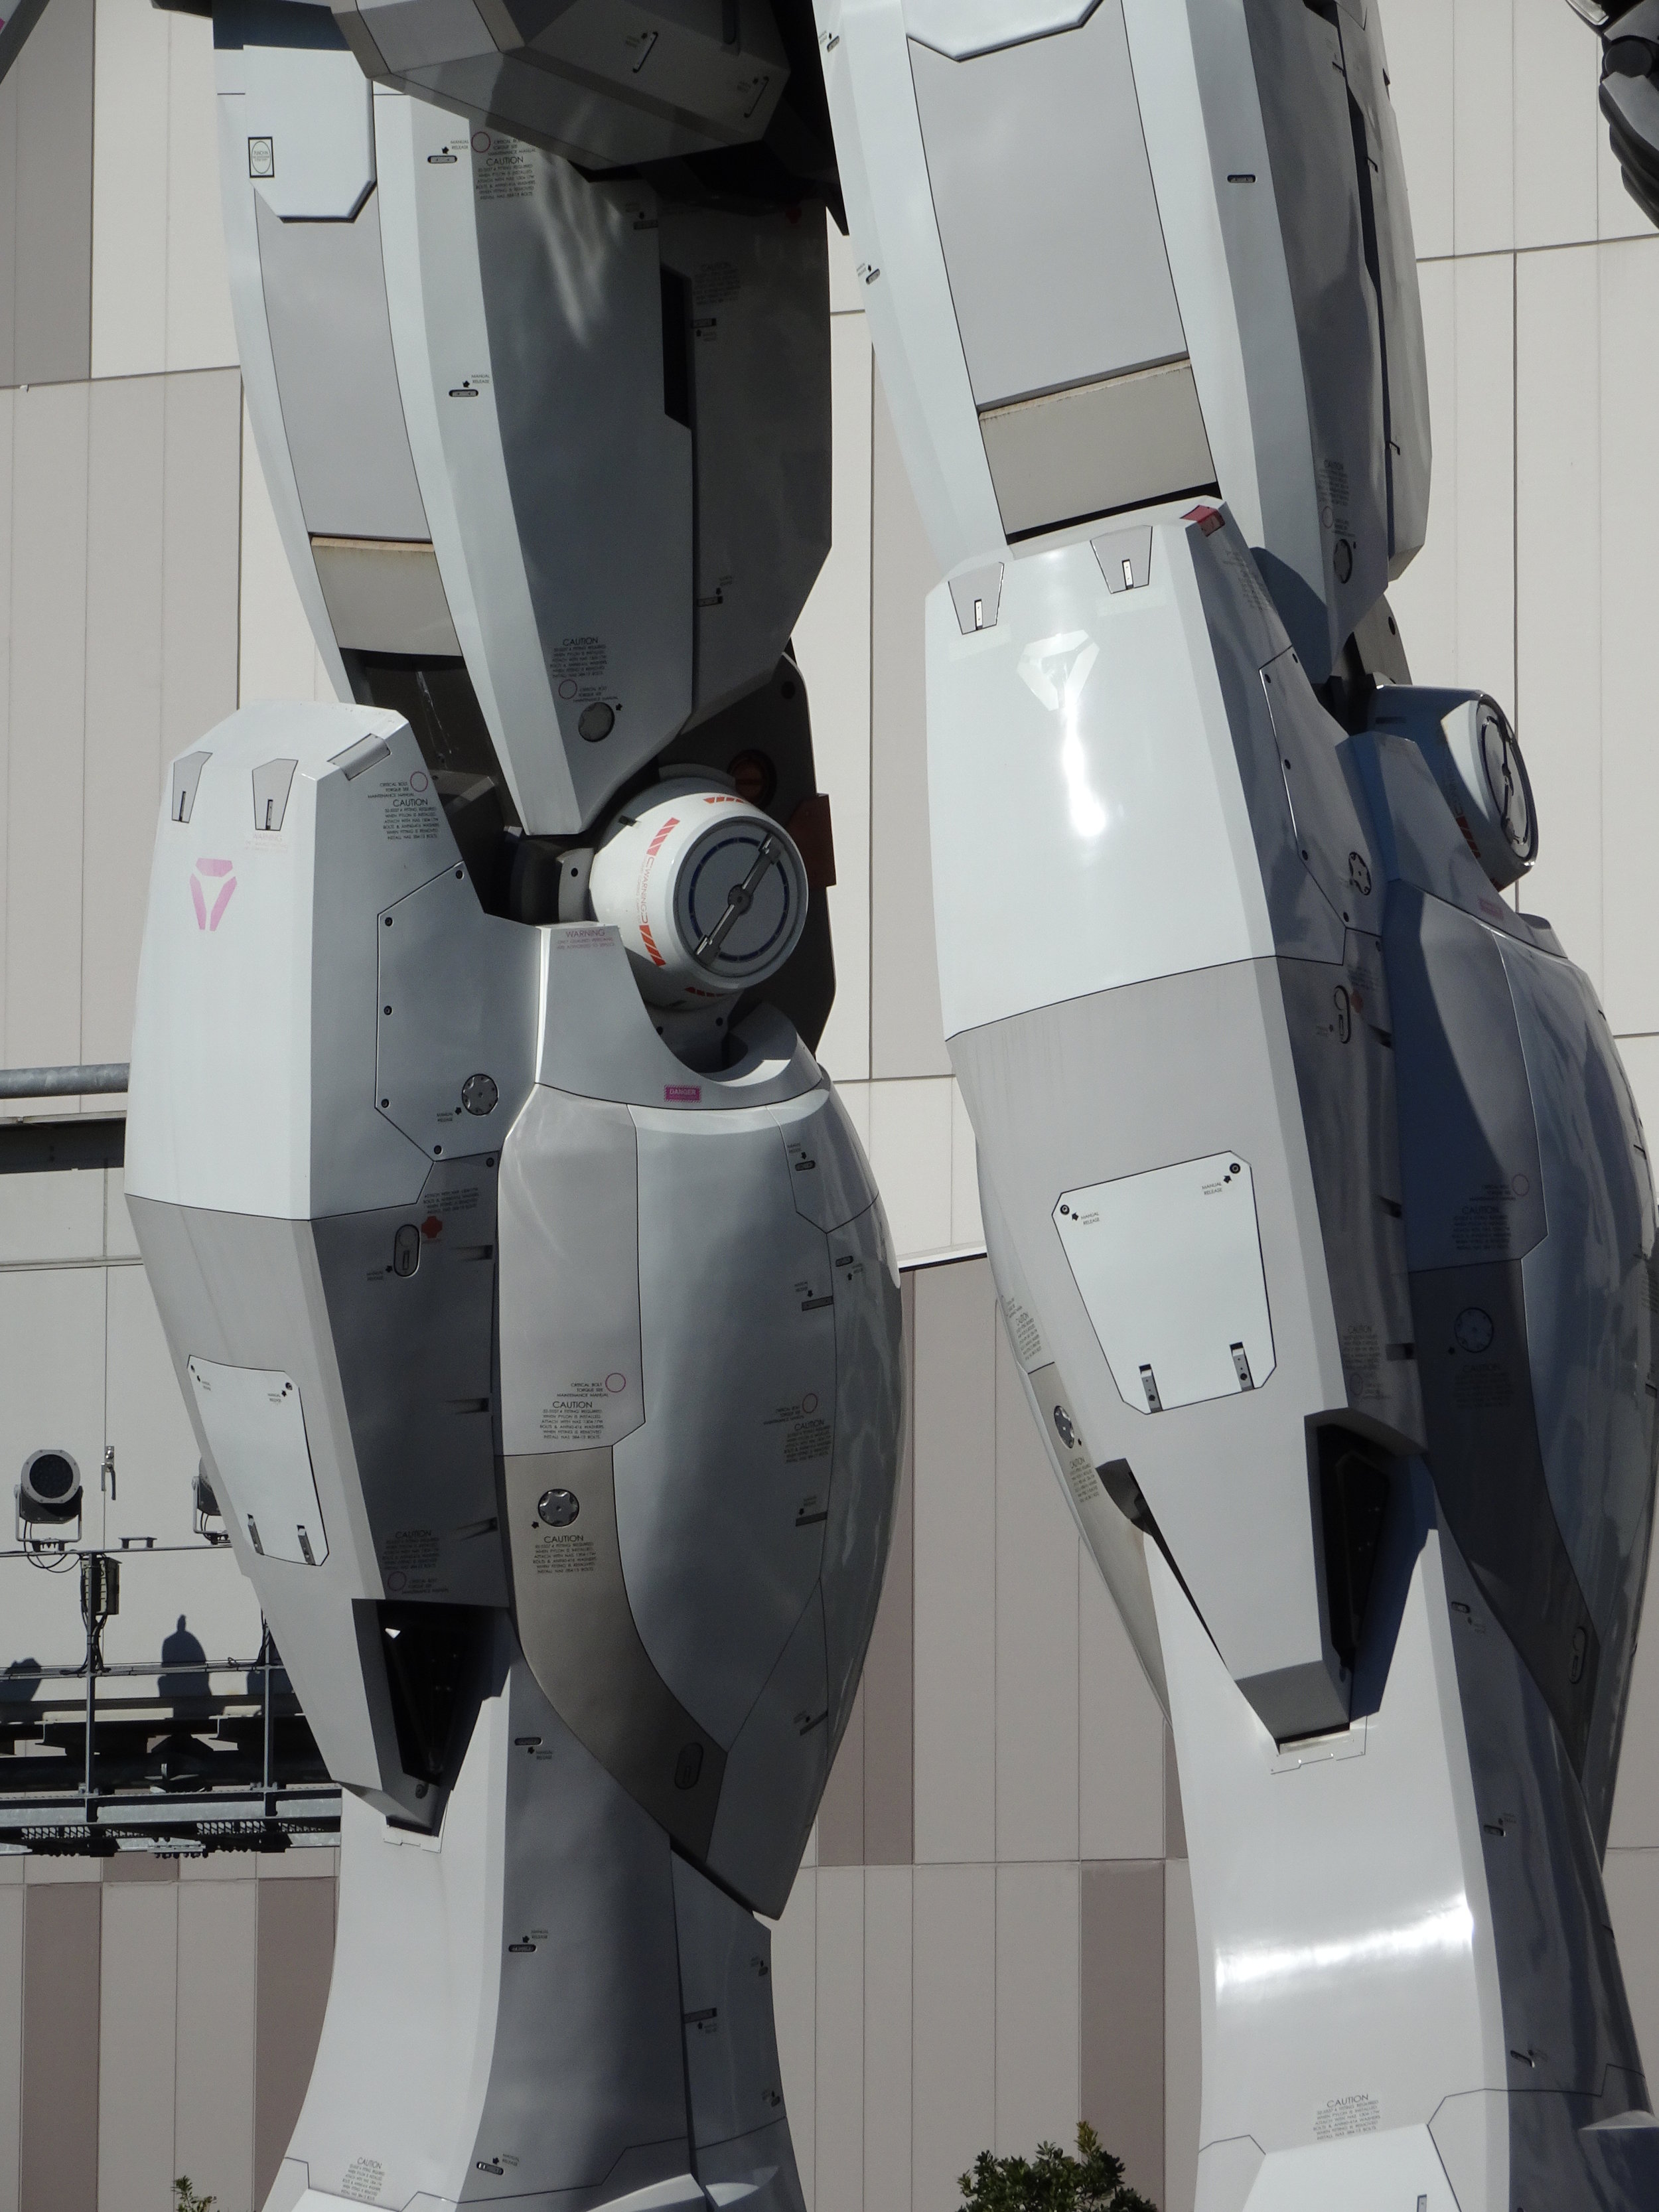 RX-78-2 Gundam 1-1 Statue - 009.jpg